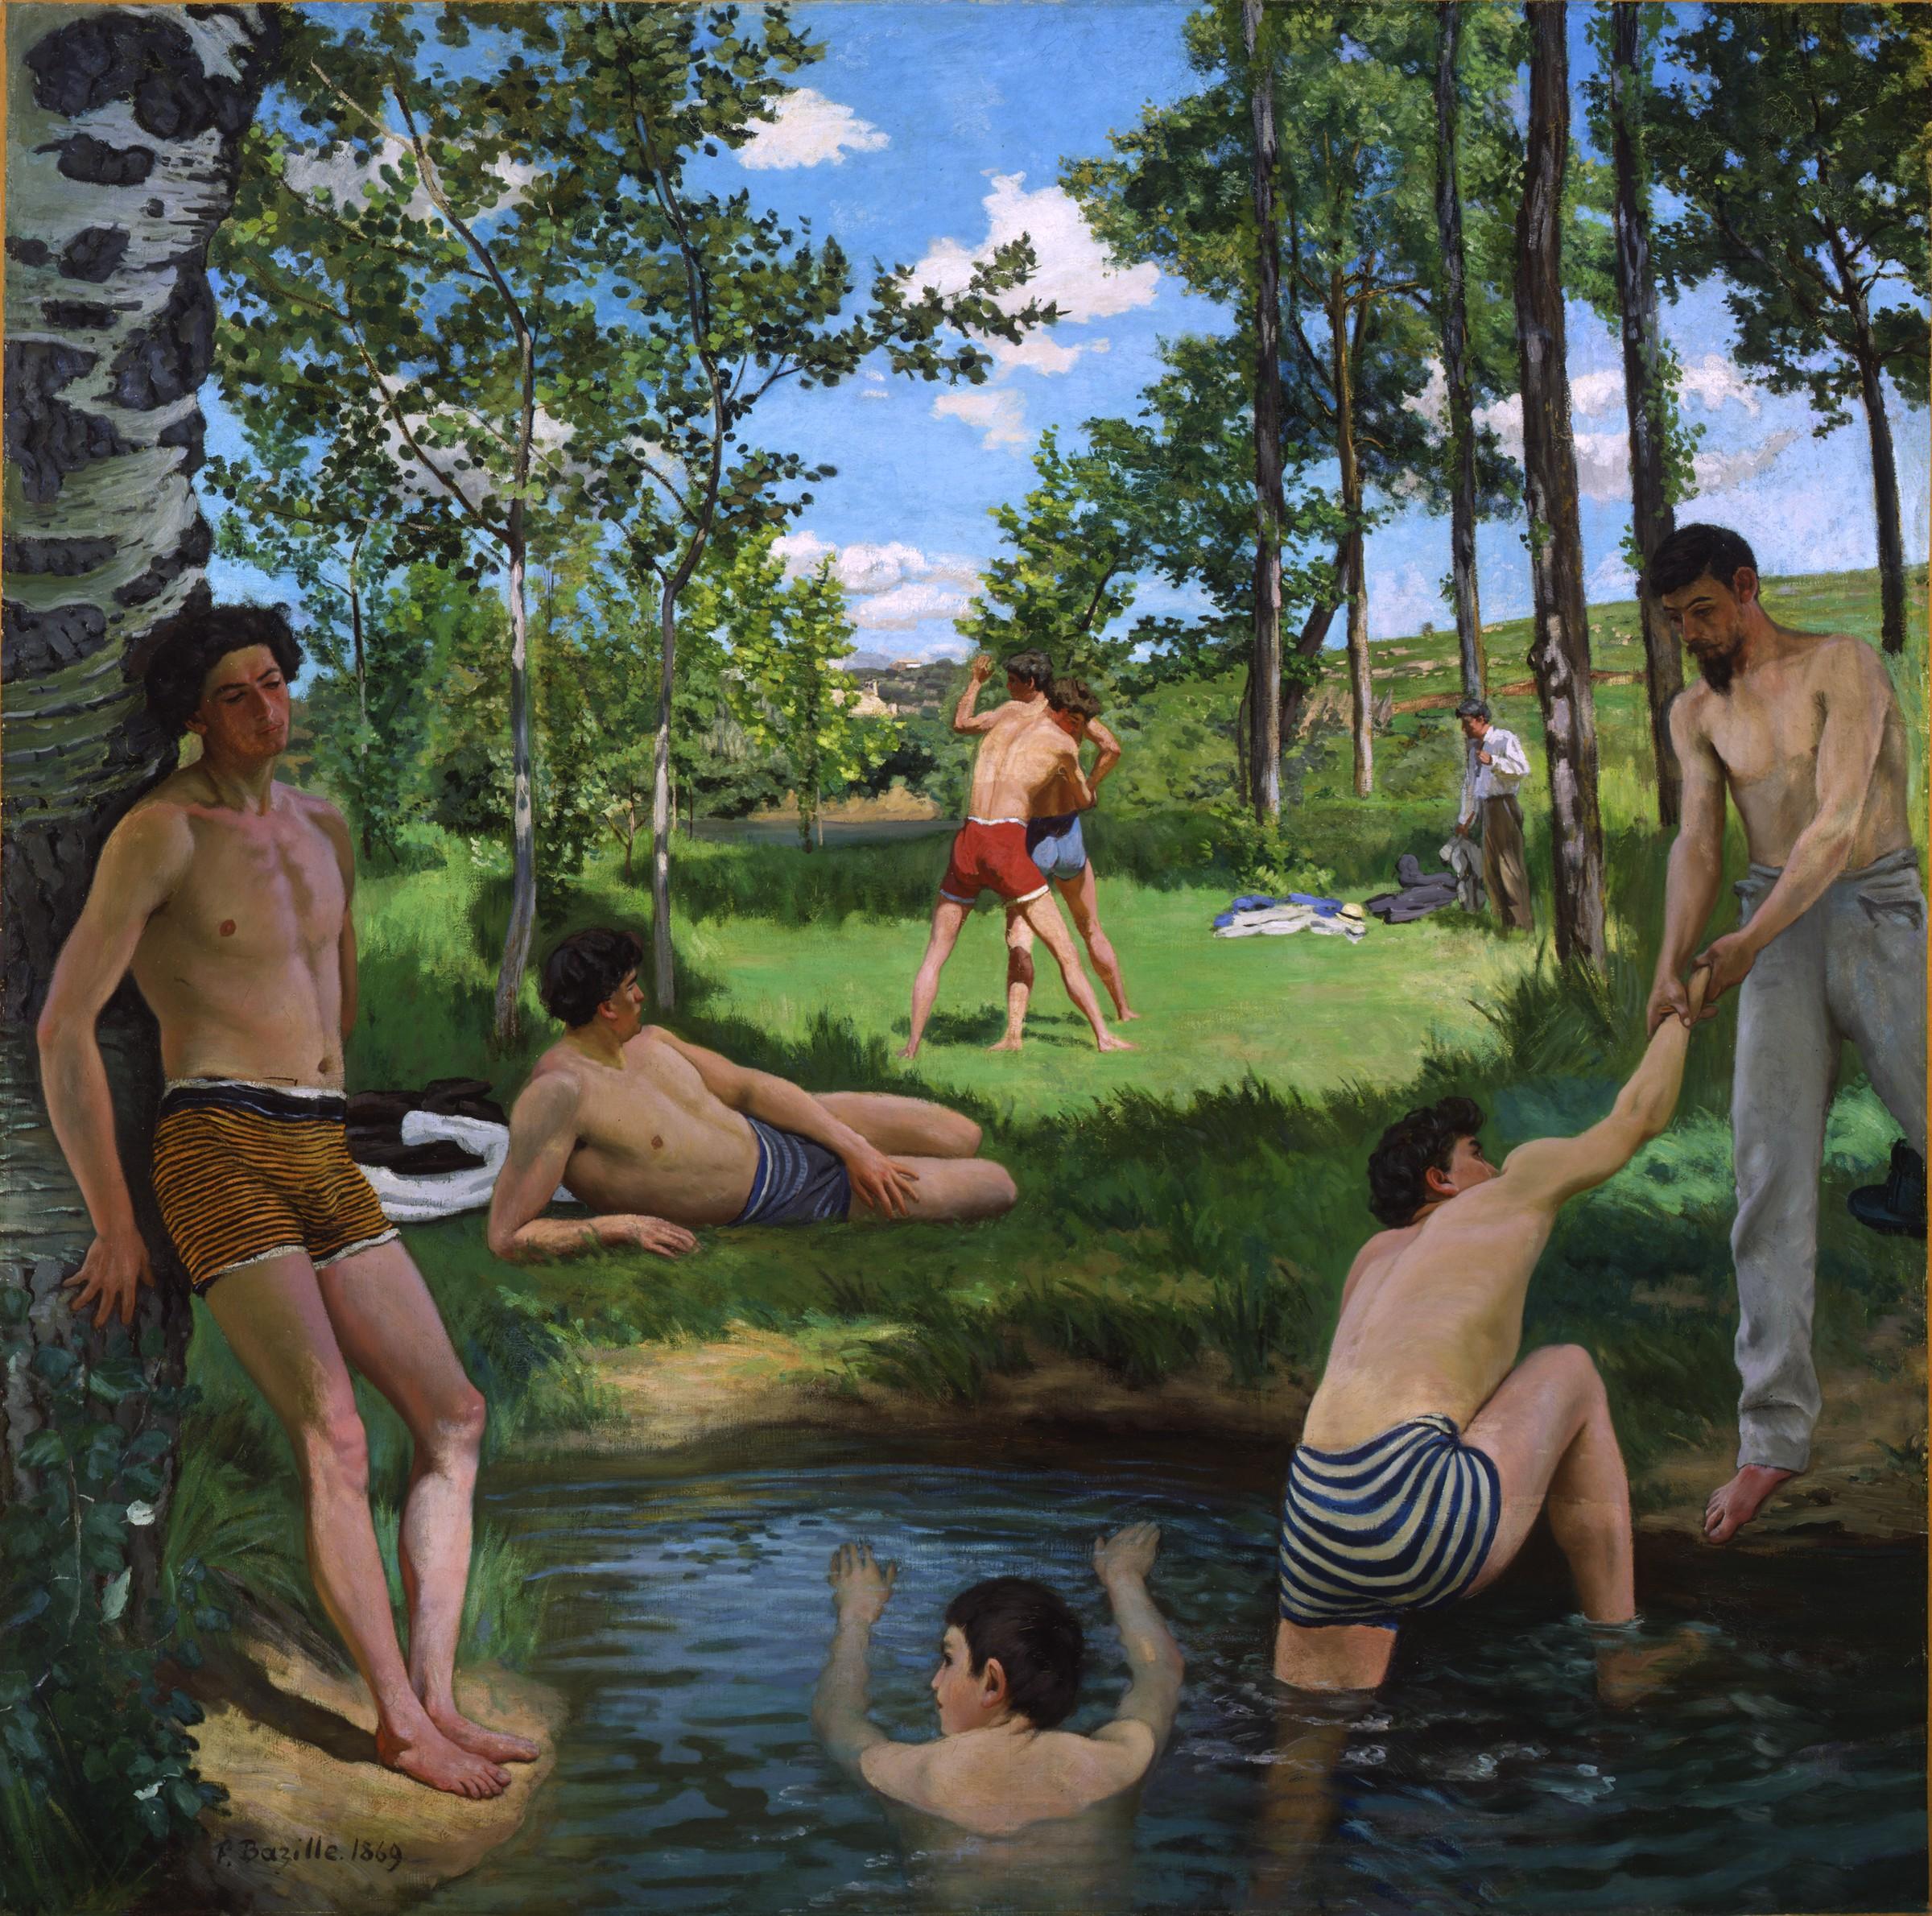 Bazille, Frédéric ~ Summer Scene, 1869, Oil on canvas Fogg Art Museum, Cambridge, Massachusetts.jpg